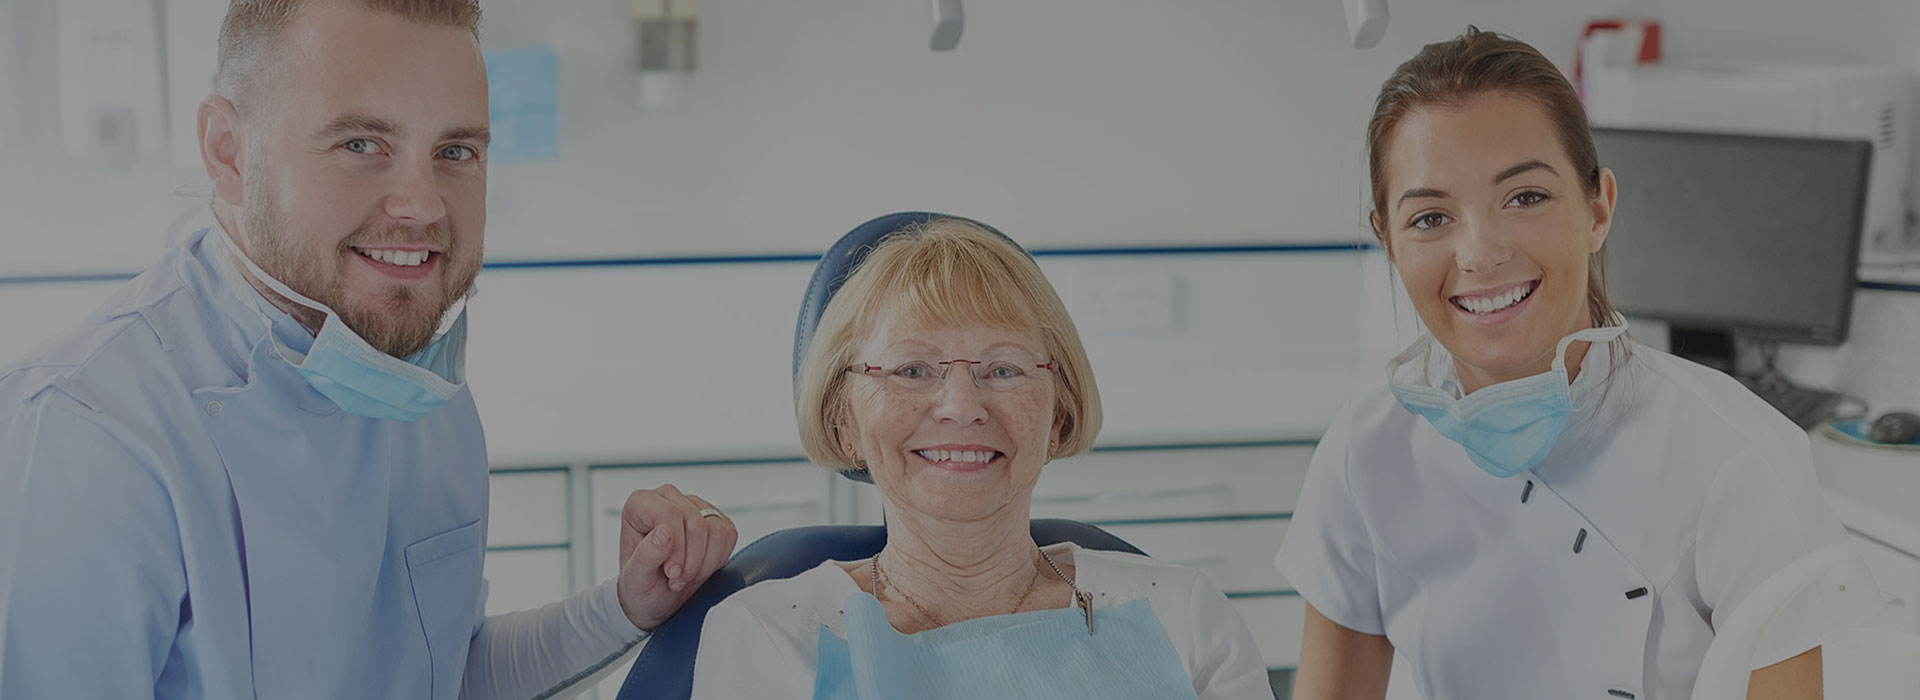 dentist gropes patient